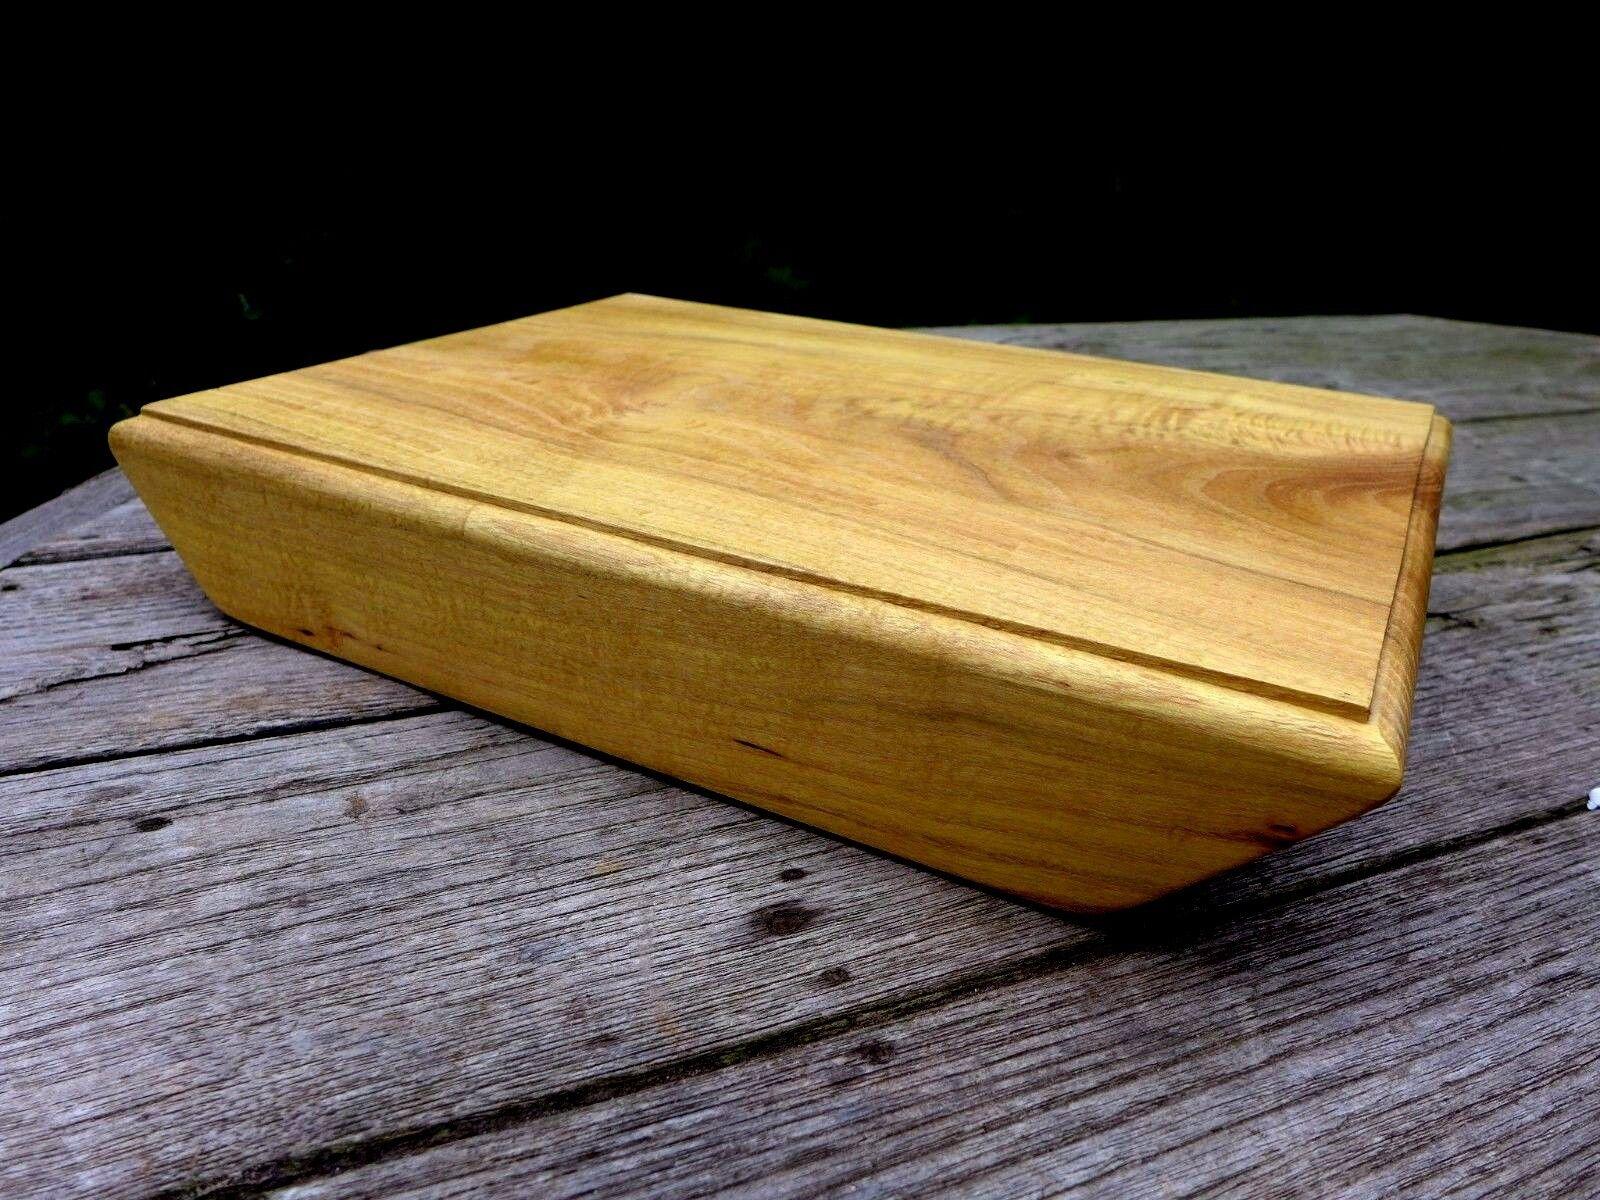 En bois servir à découper acacia Board, fabriqué à la main et fabriqué à la main un seul